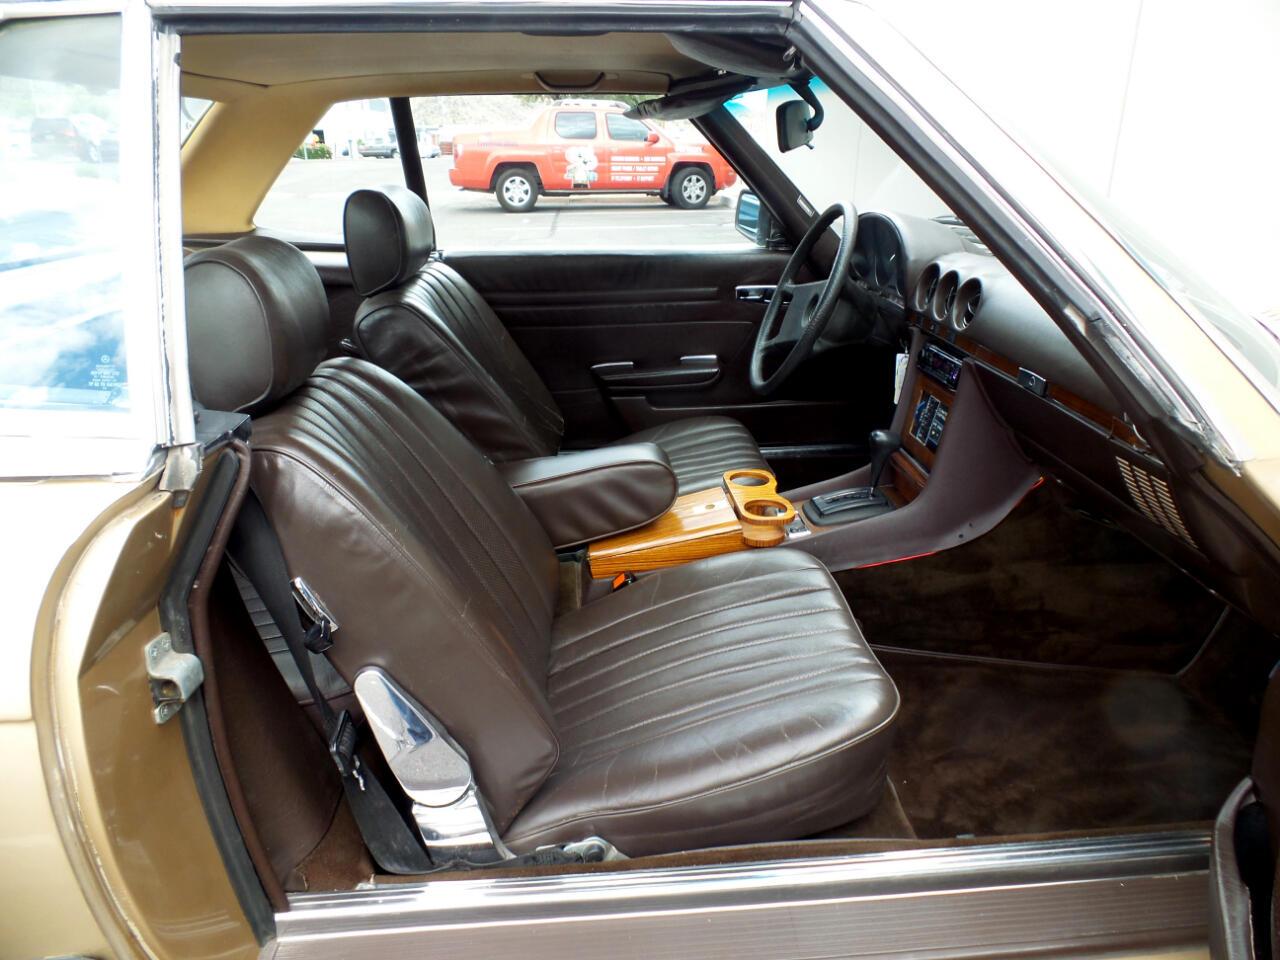 1980 Mercedes-Benz 450 SL Convertible